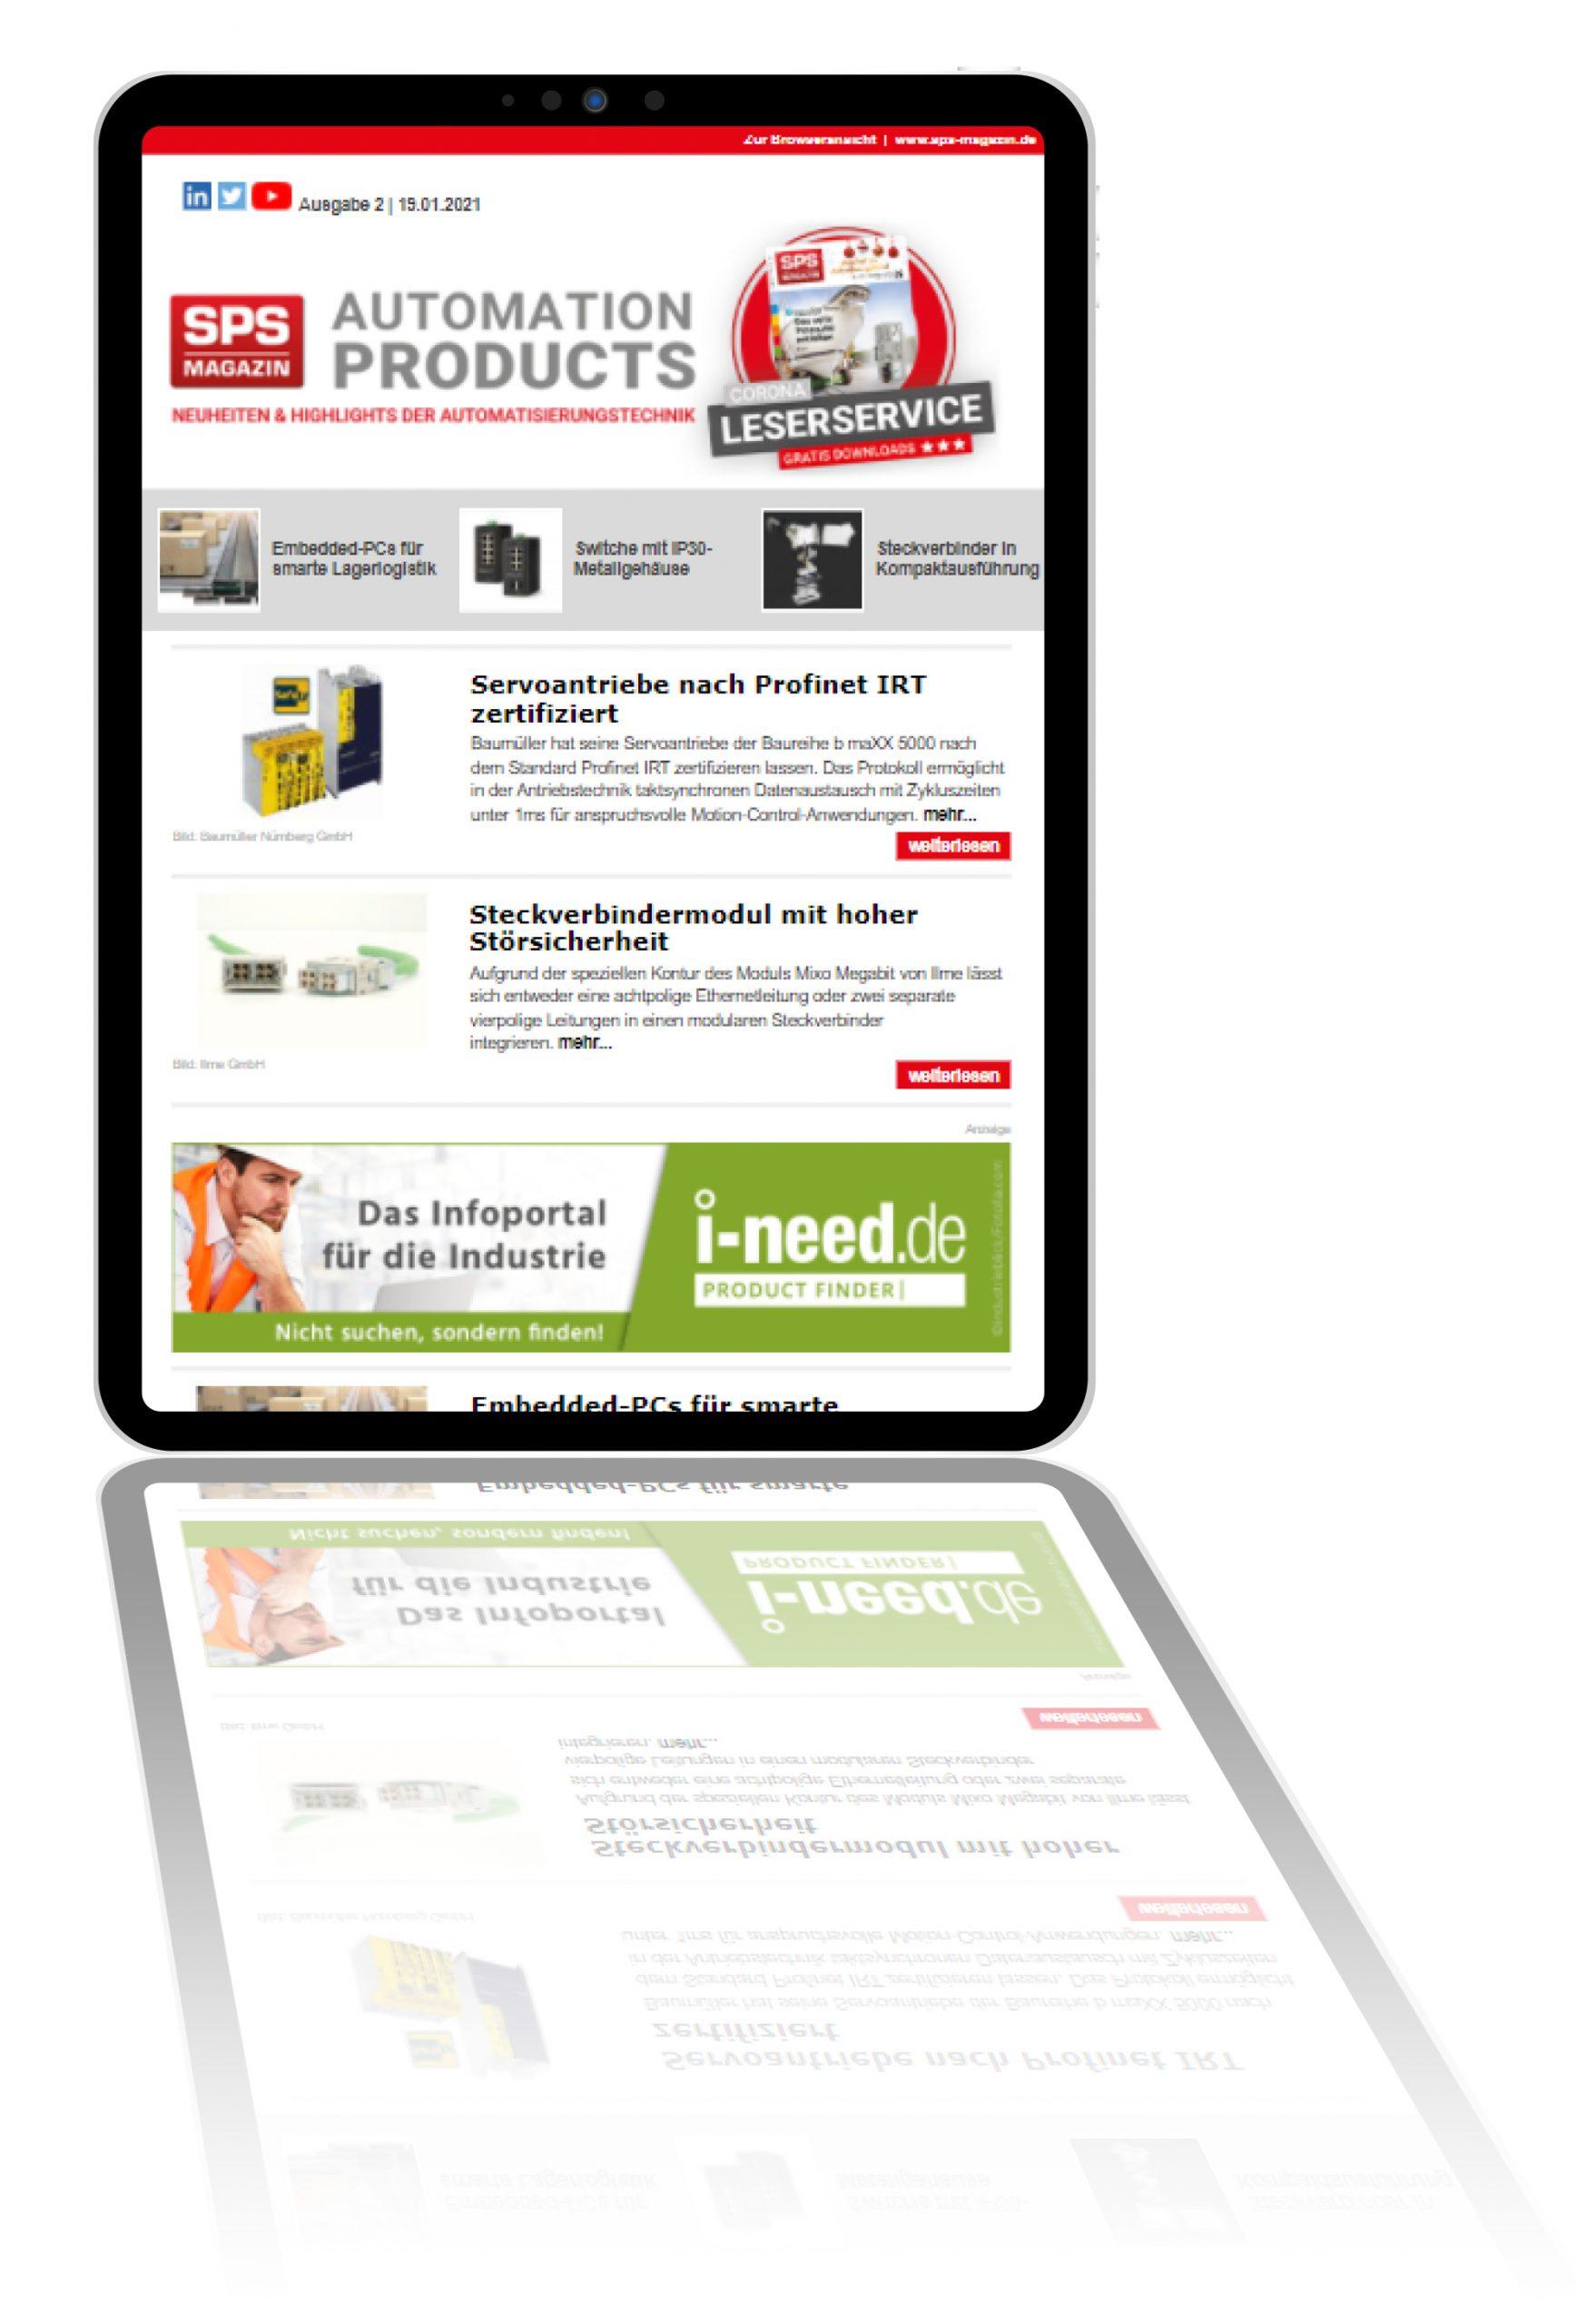 Automation Product Newsletter im neuen Layout